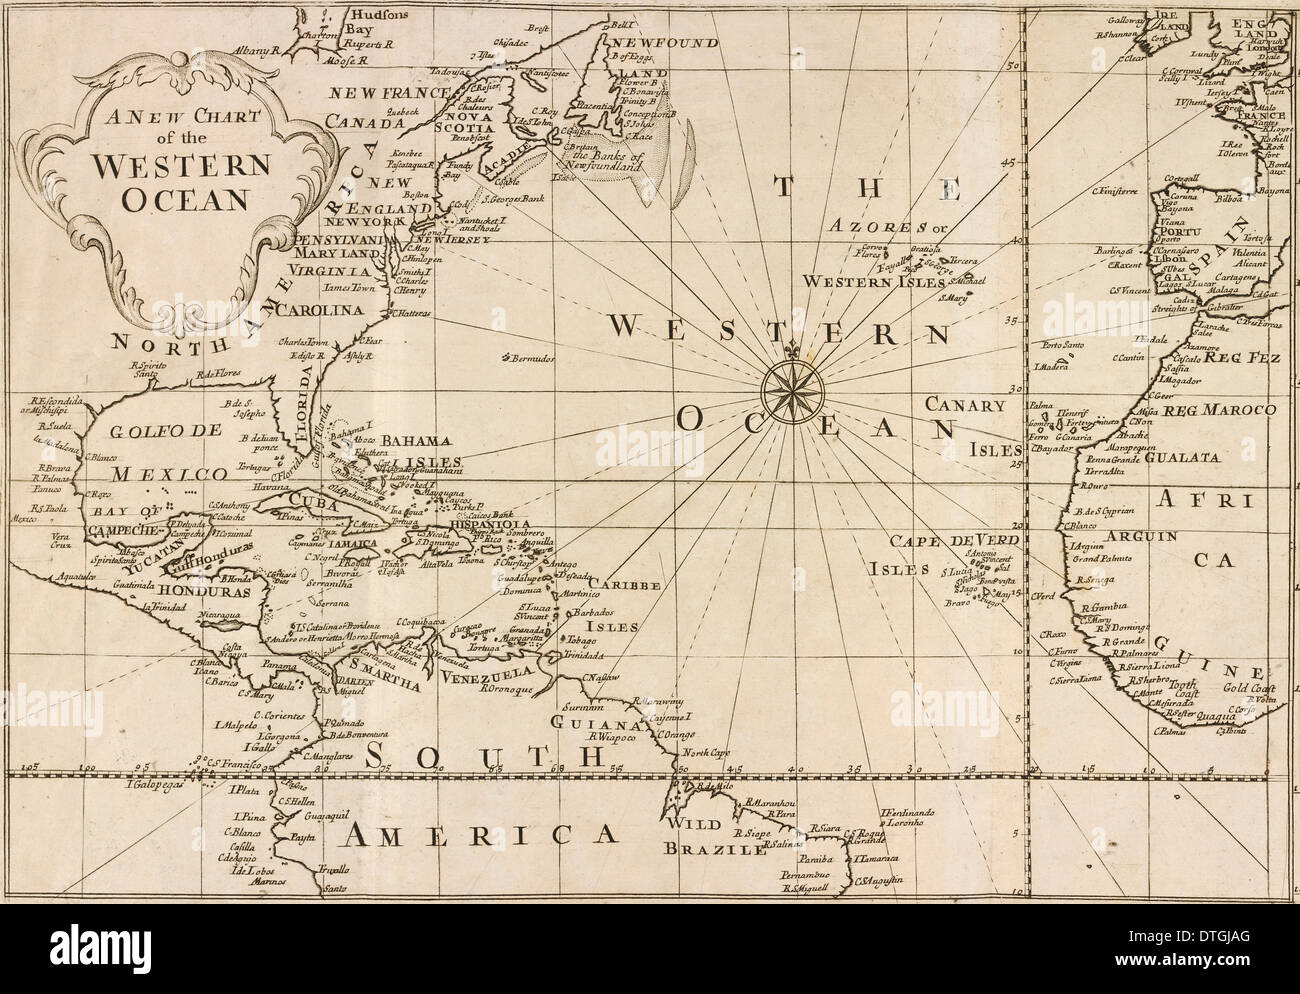 Map of Western Ocean - Stock Image